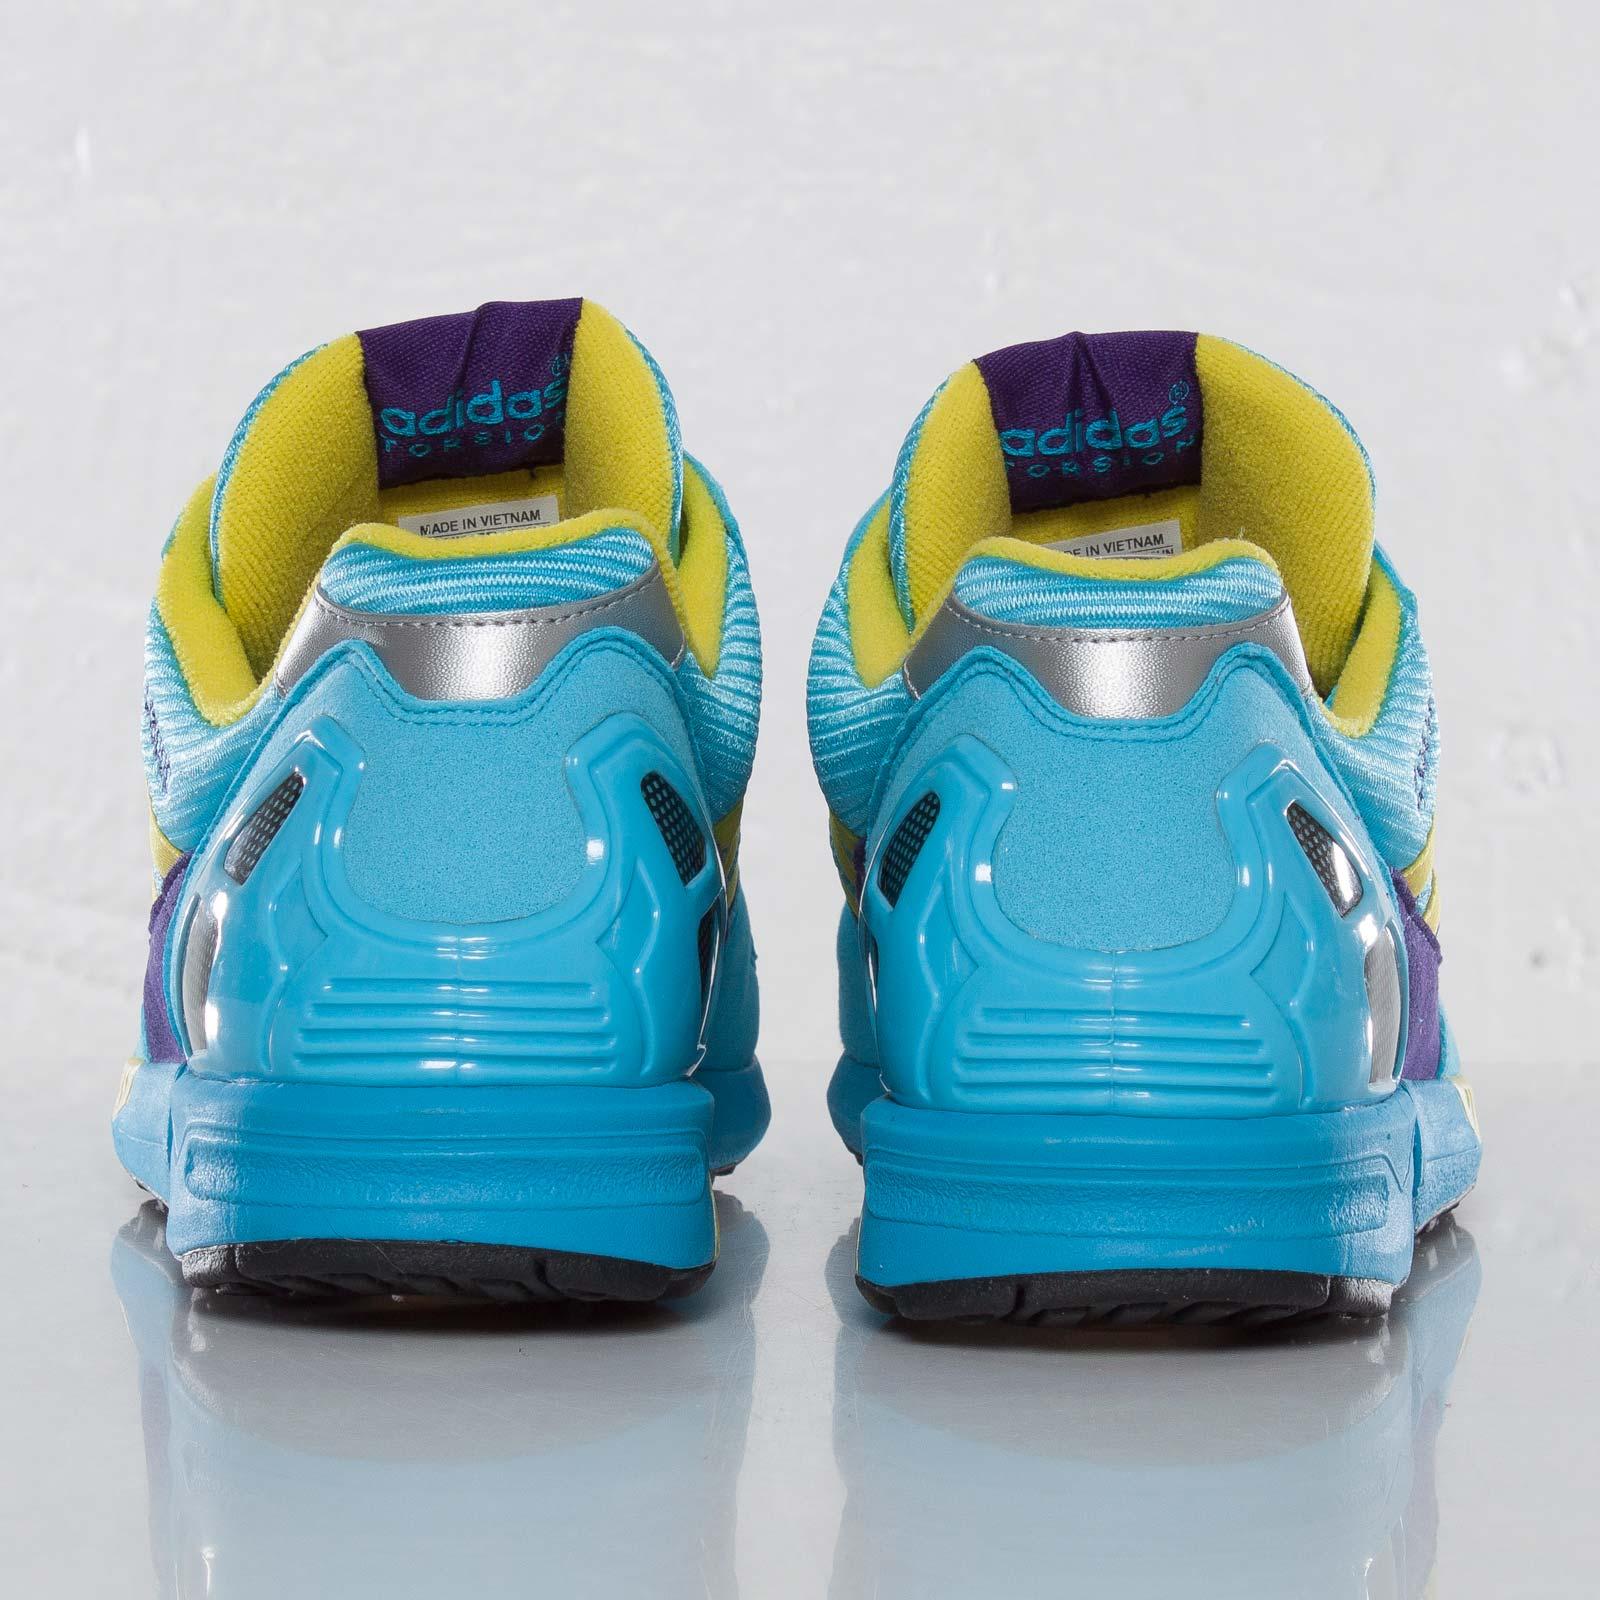 2c4baf373 ... get ireland adidas zx 8000 adidas zx 8000 adidas zx 8000 5bb4b 15e4b  ff102 406ee